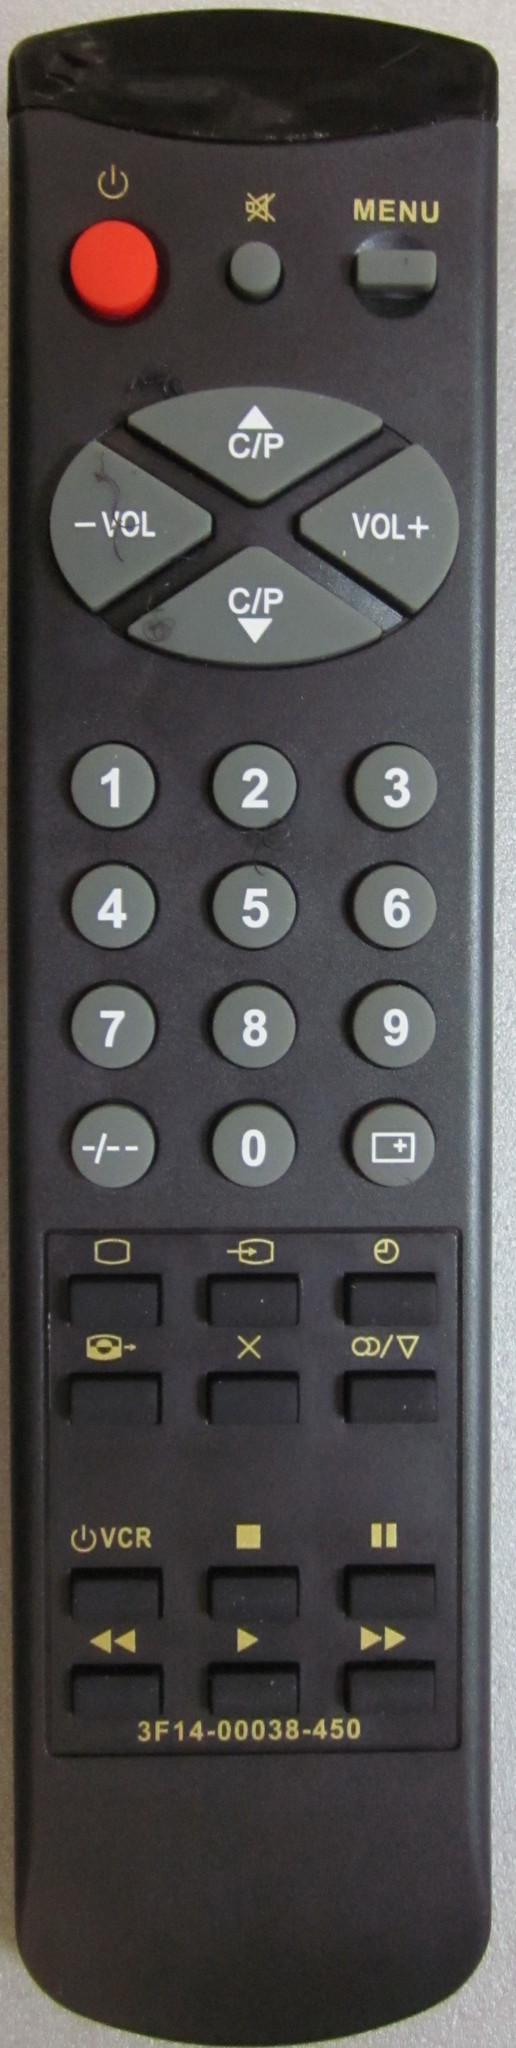 3F14-00038-450